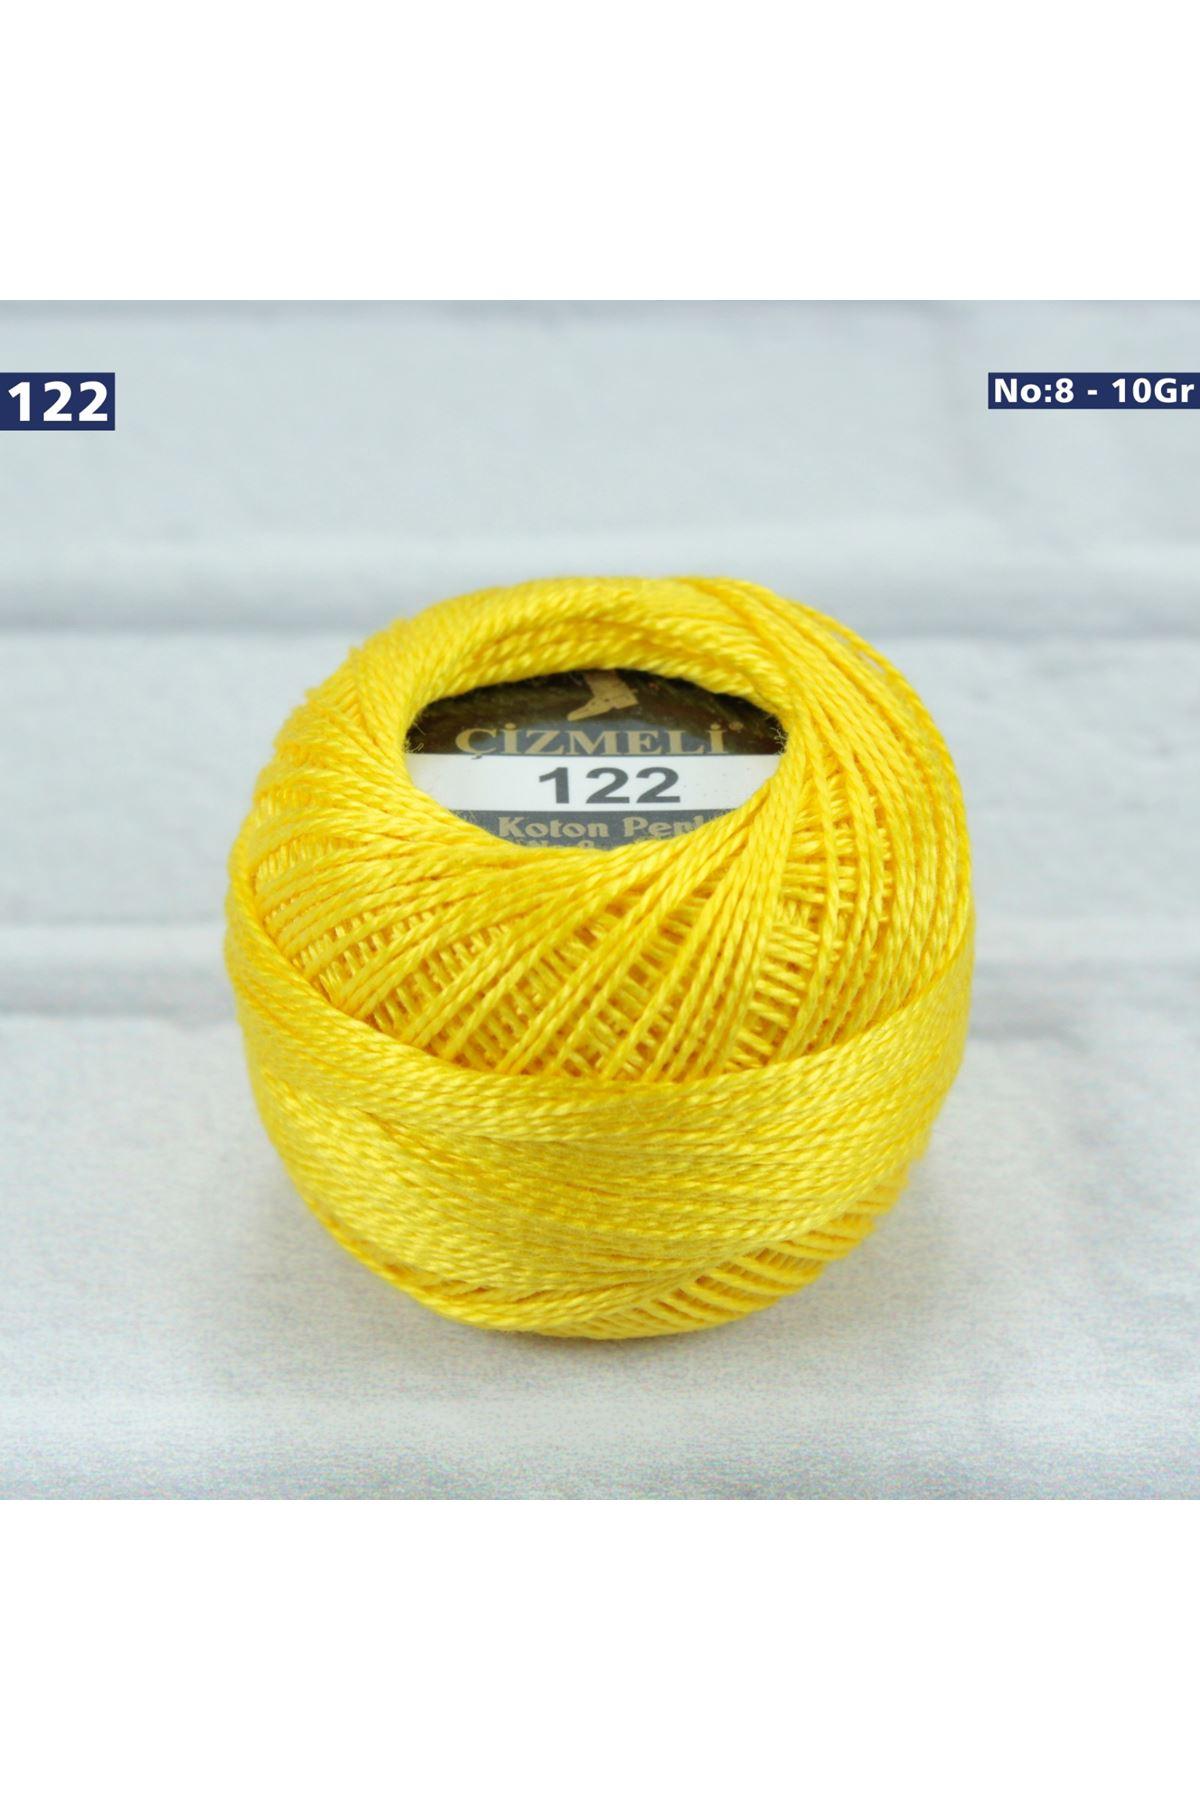 Çizmeli Cotton Perle Nakış İpliği No: 122